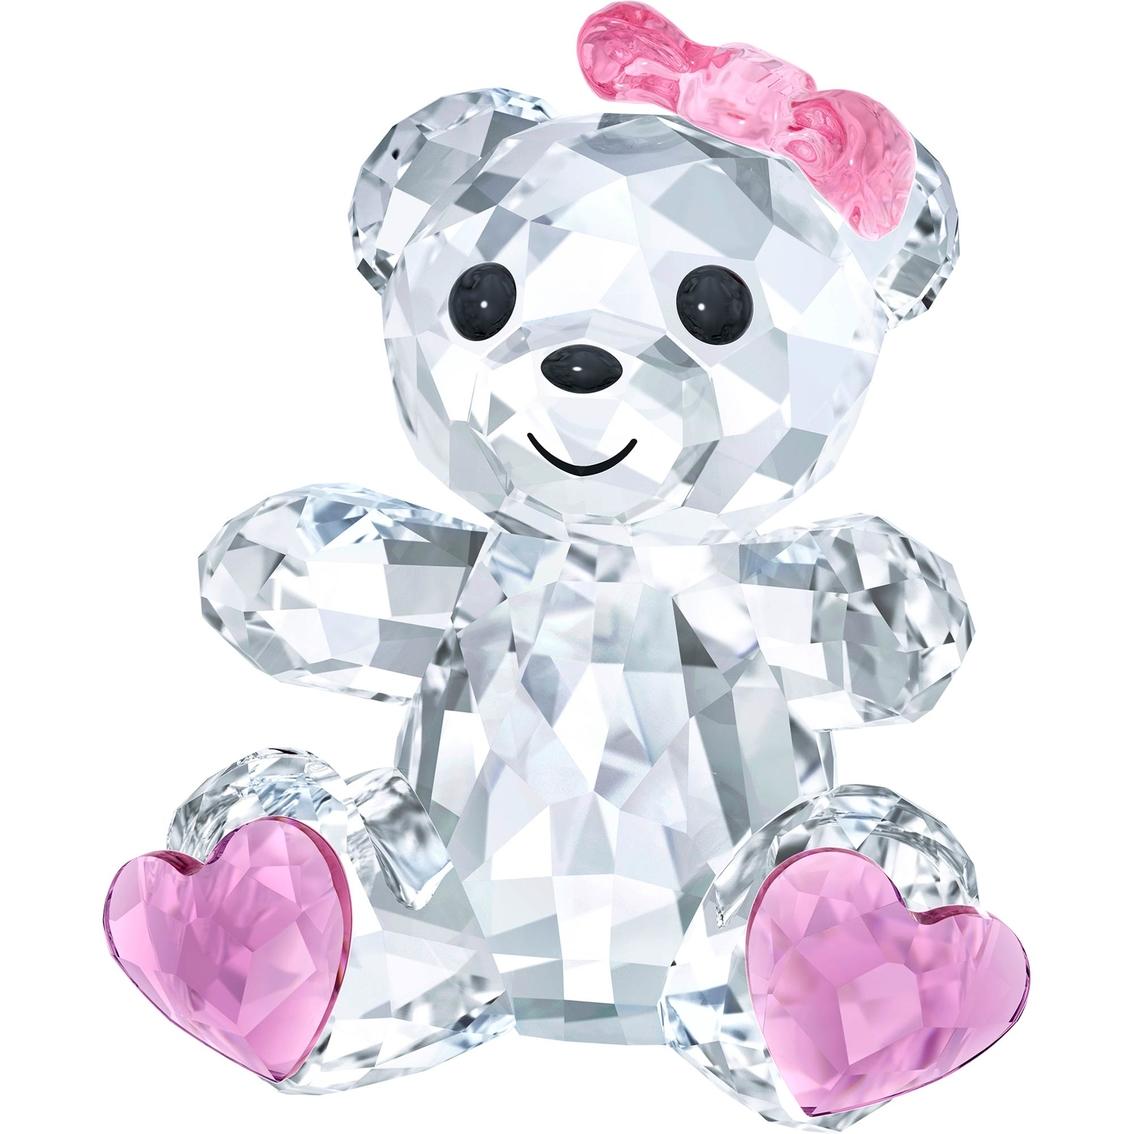 187f7d4595 Swarovski Kris Bear, Sweetheart | Collectible Figurines | Gifts ...